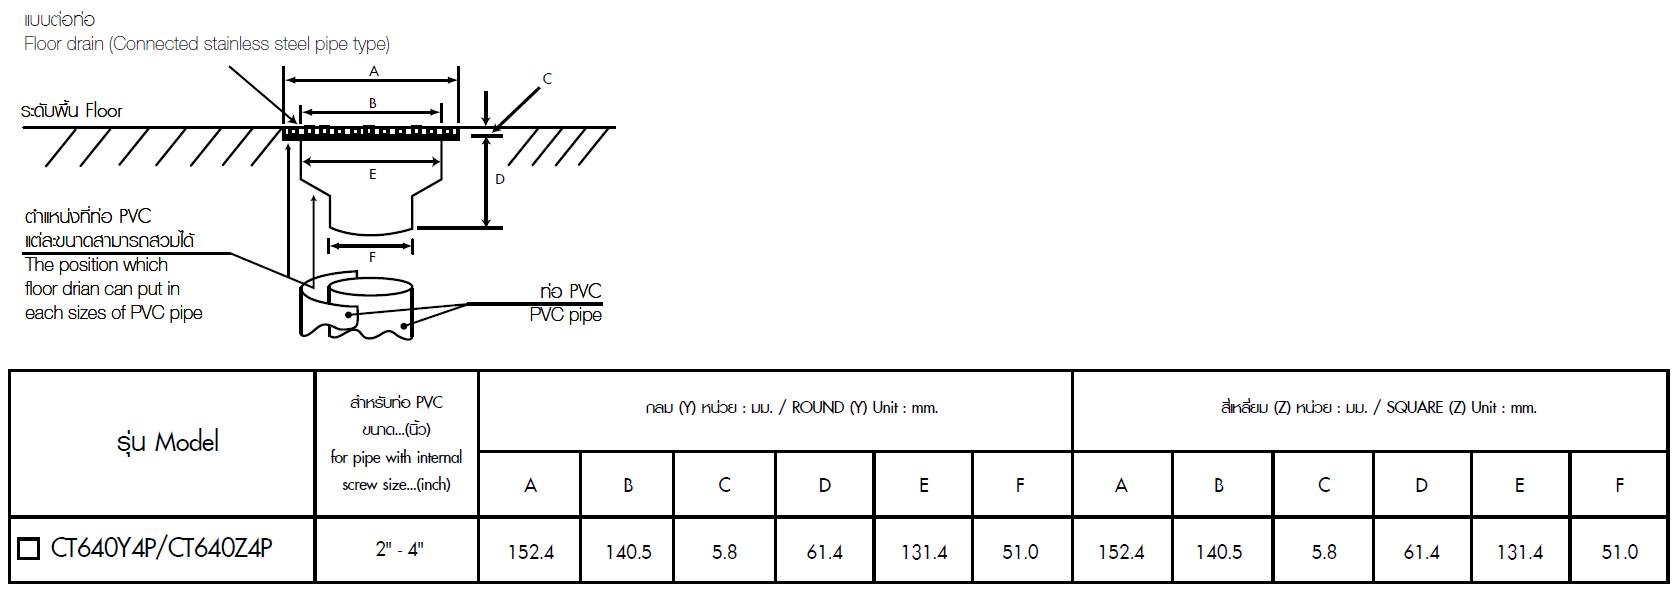 CT640Z4P(HM)    ���ç�ѹ�����൹�����������Դ��駡Ѻ��;��իբ�Ҵ 2-4 ���� (˹���Ź 6 ����)